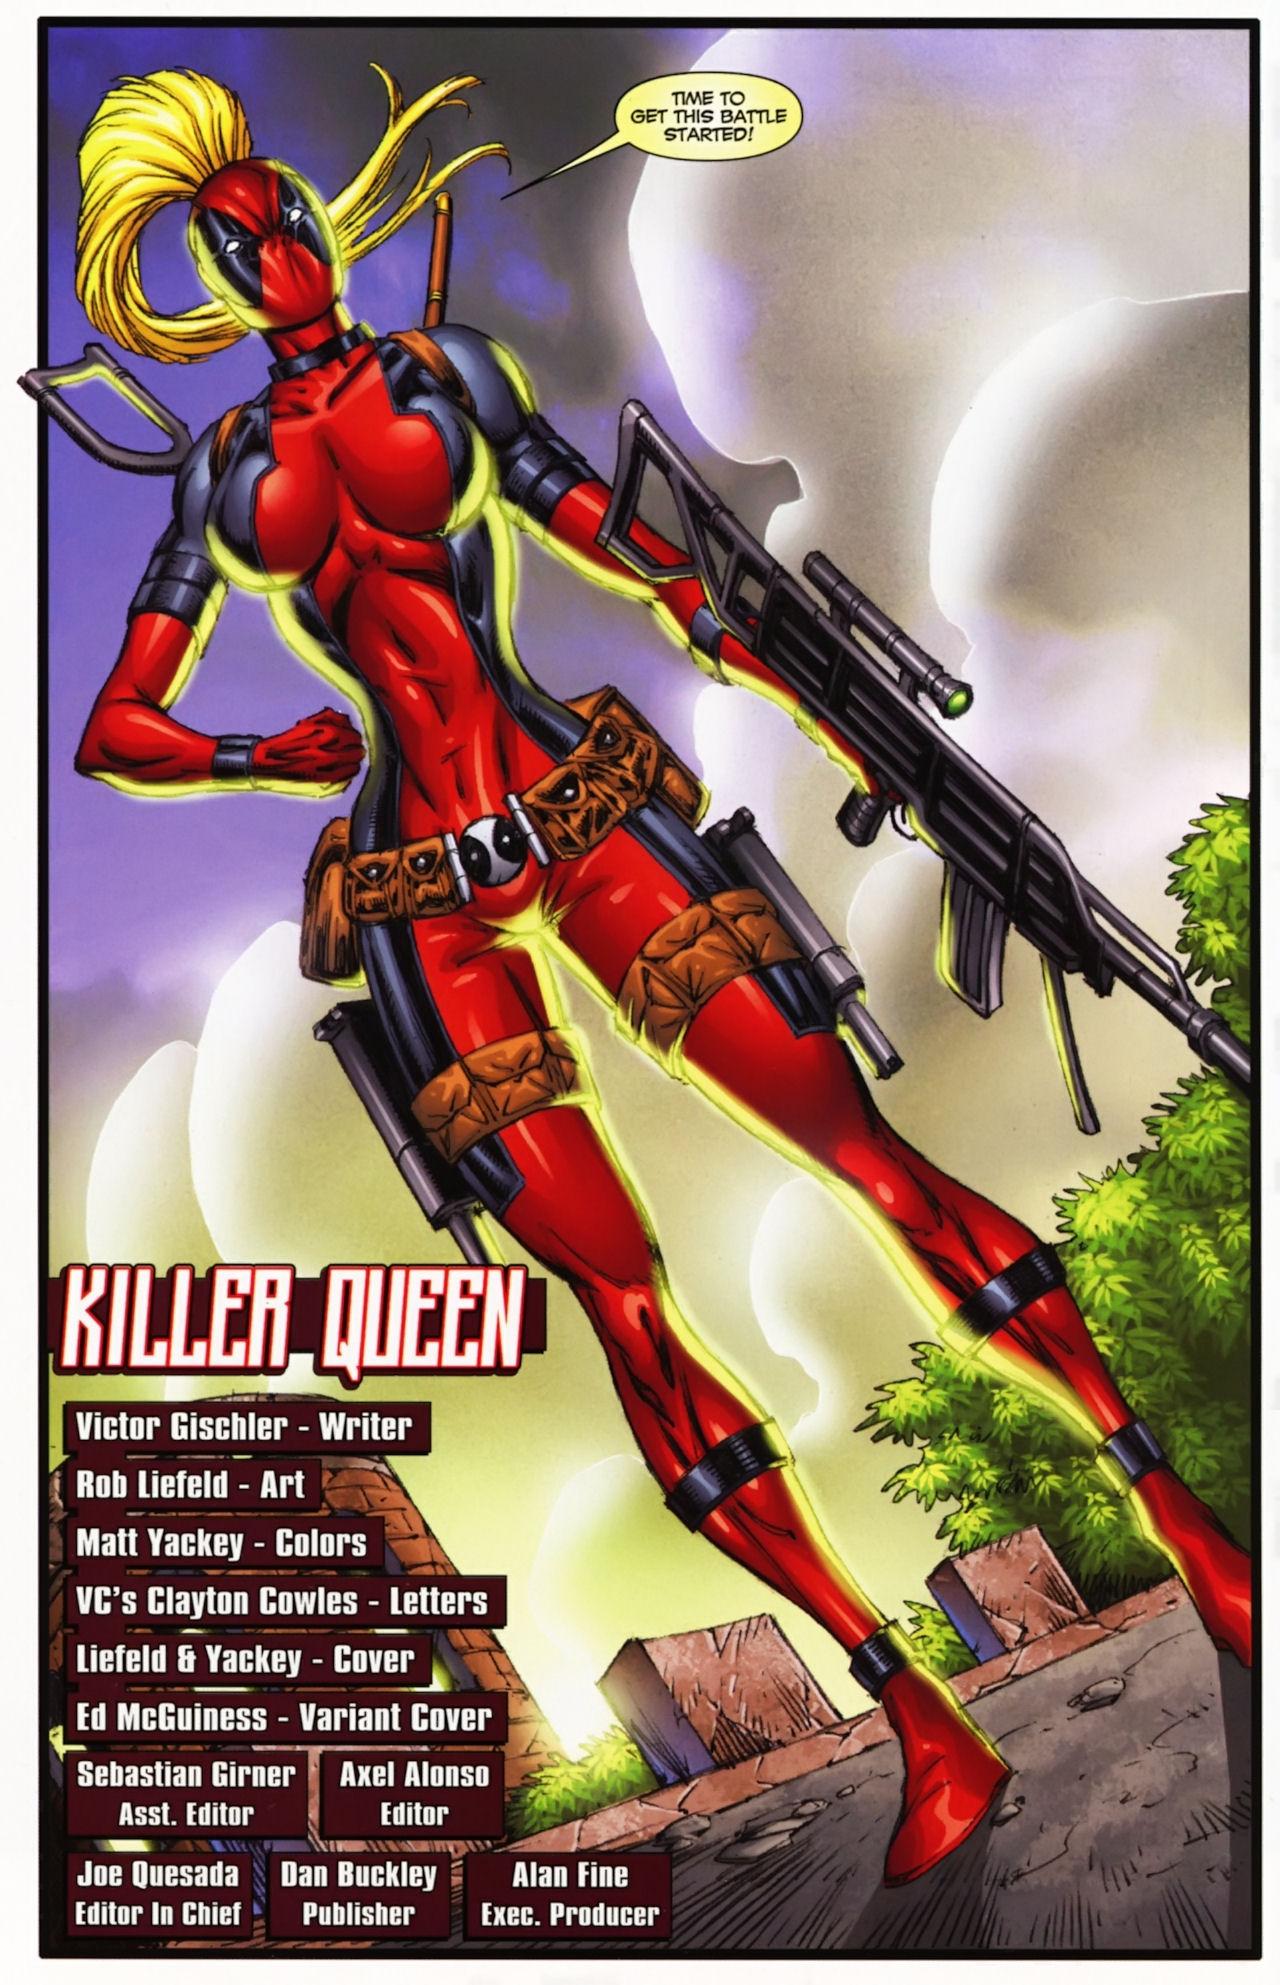 Lady deadpool help please cosplay link 1 solutioingenieria Images